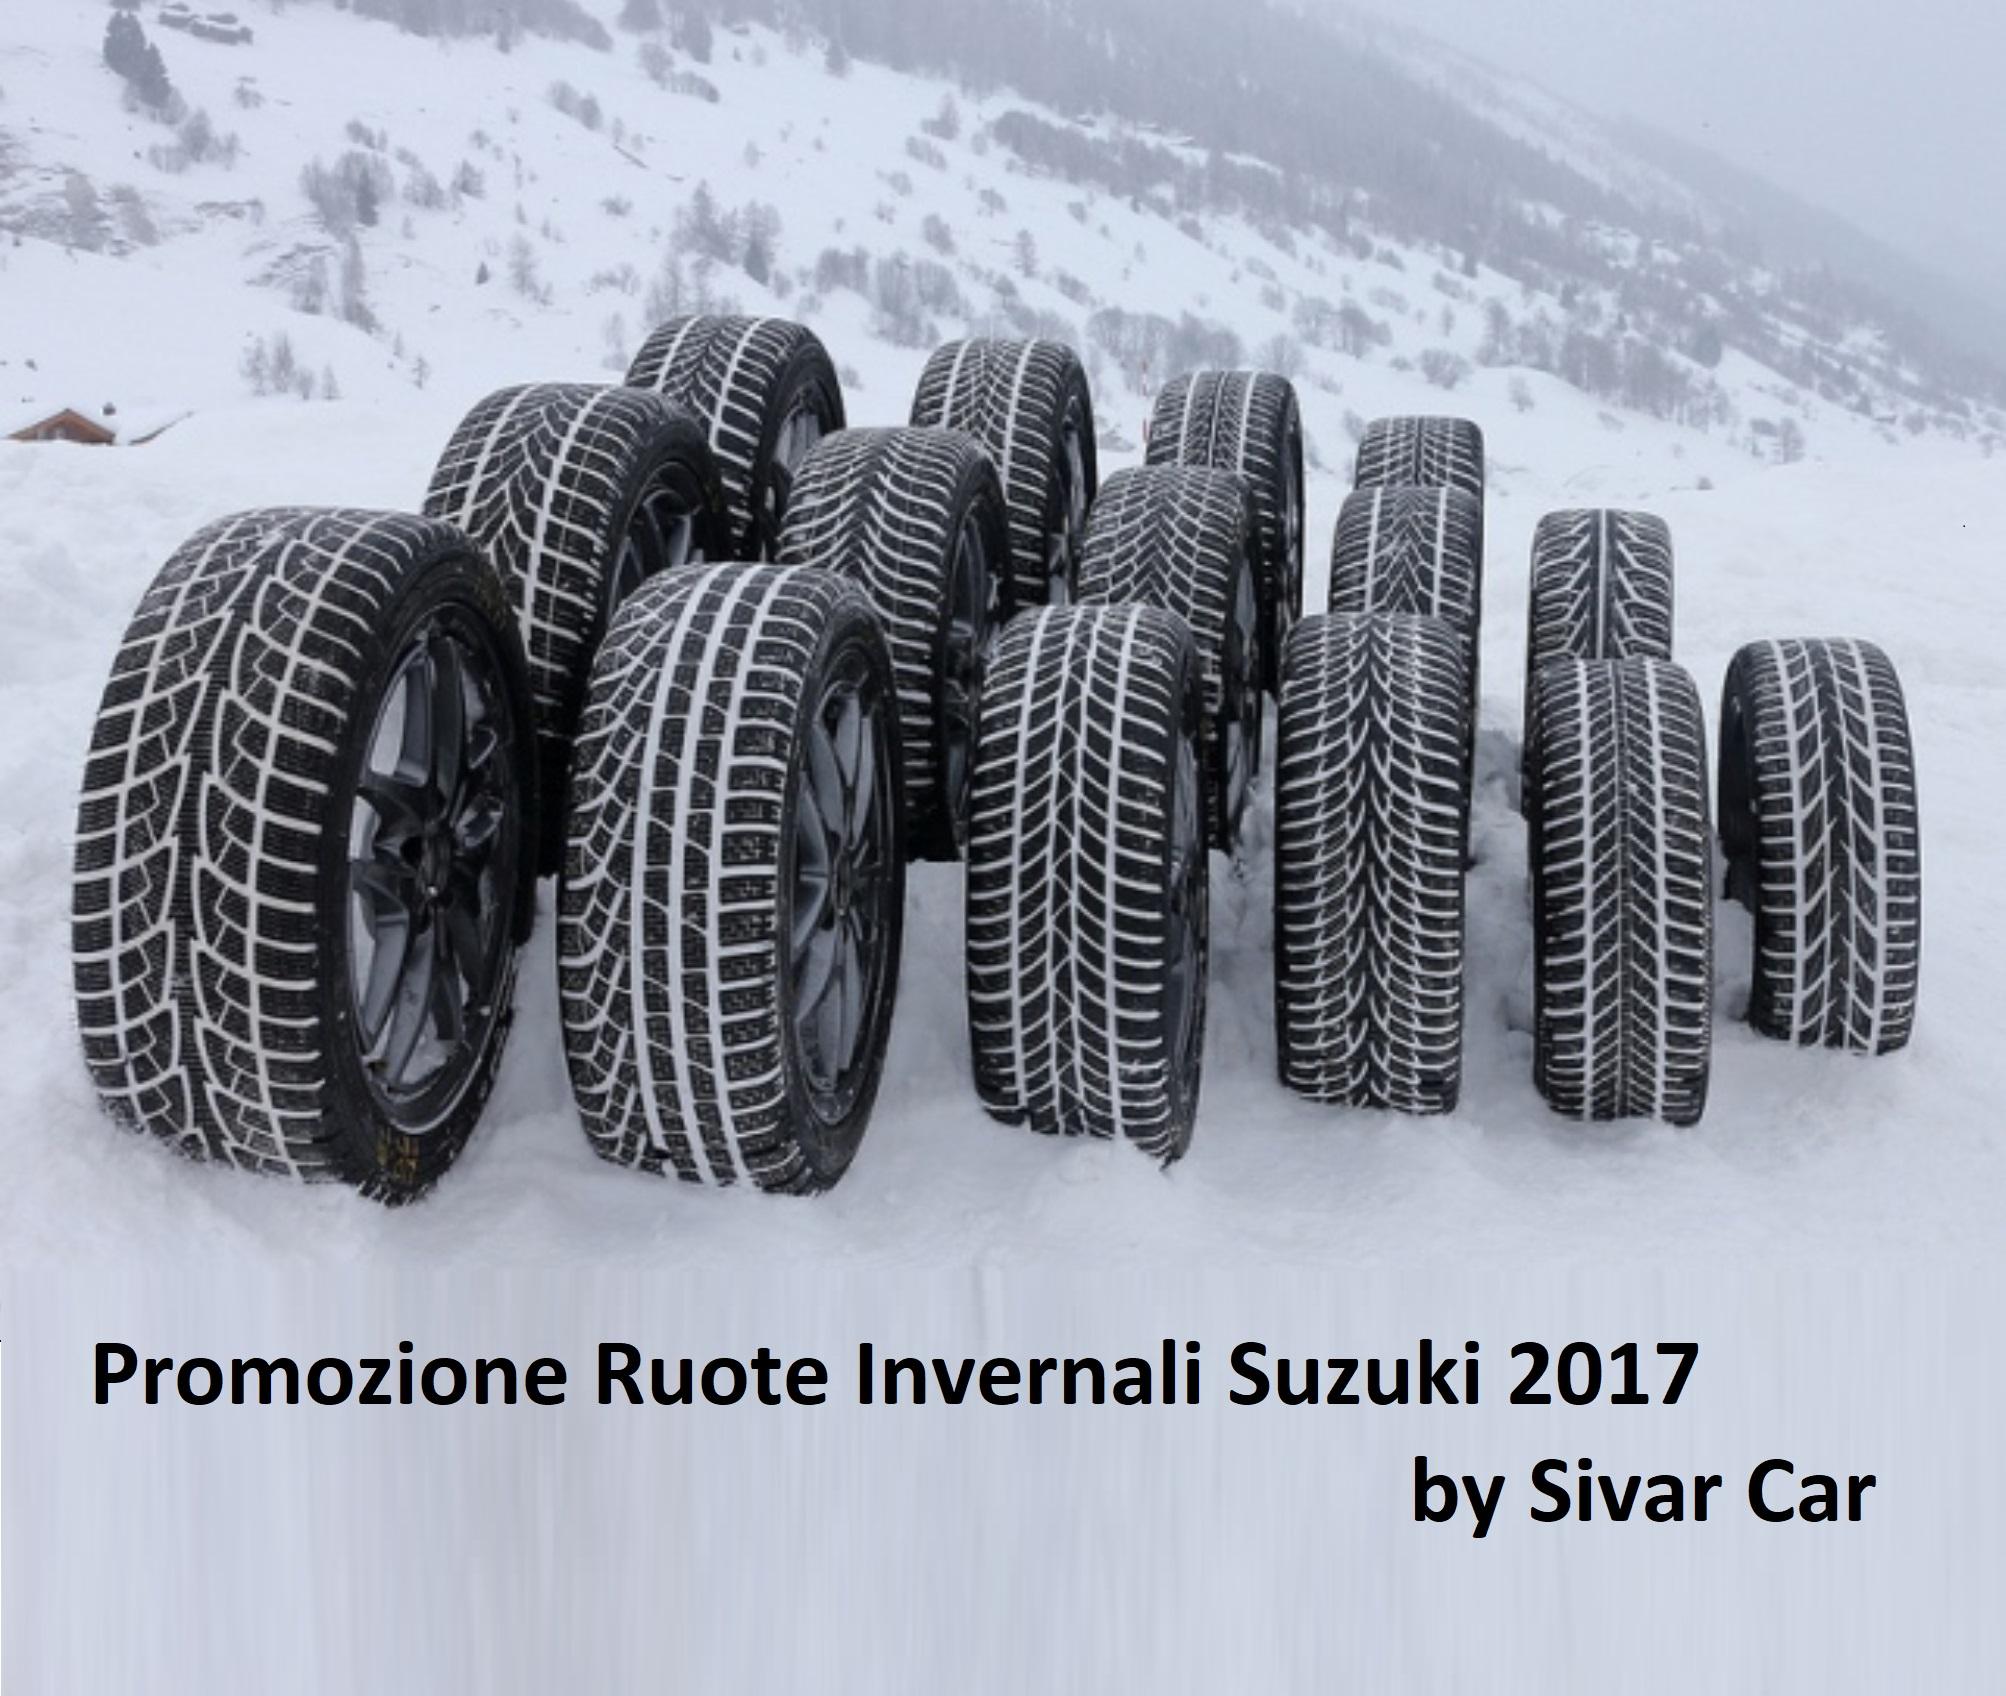 2017-11 ruote invernali sivar